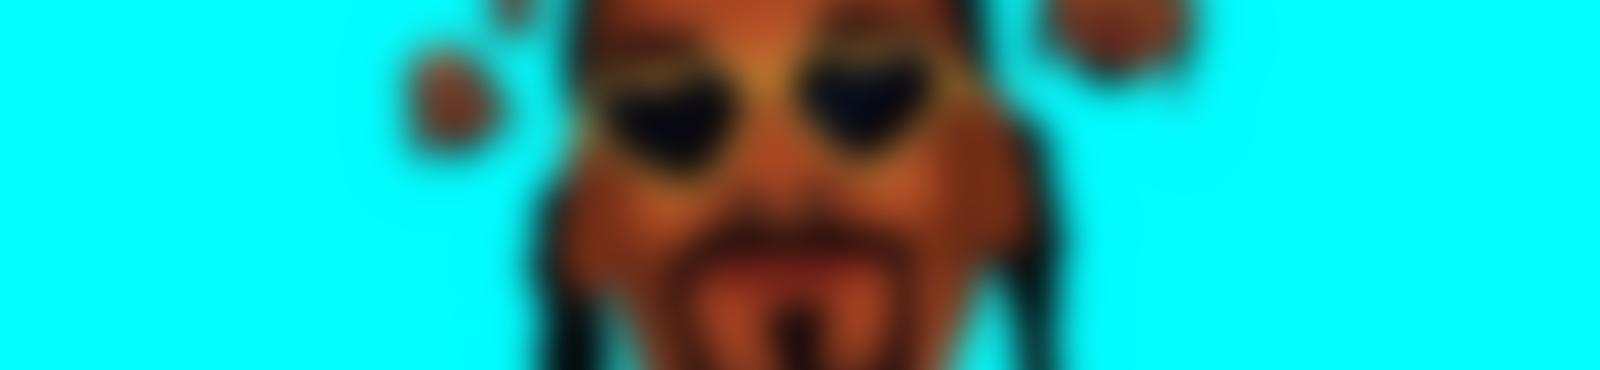 Blurred 5bbe86dd 3f1d 44fe 8df9 95f0e8d8a24e